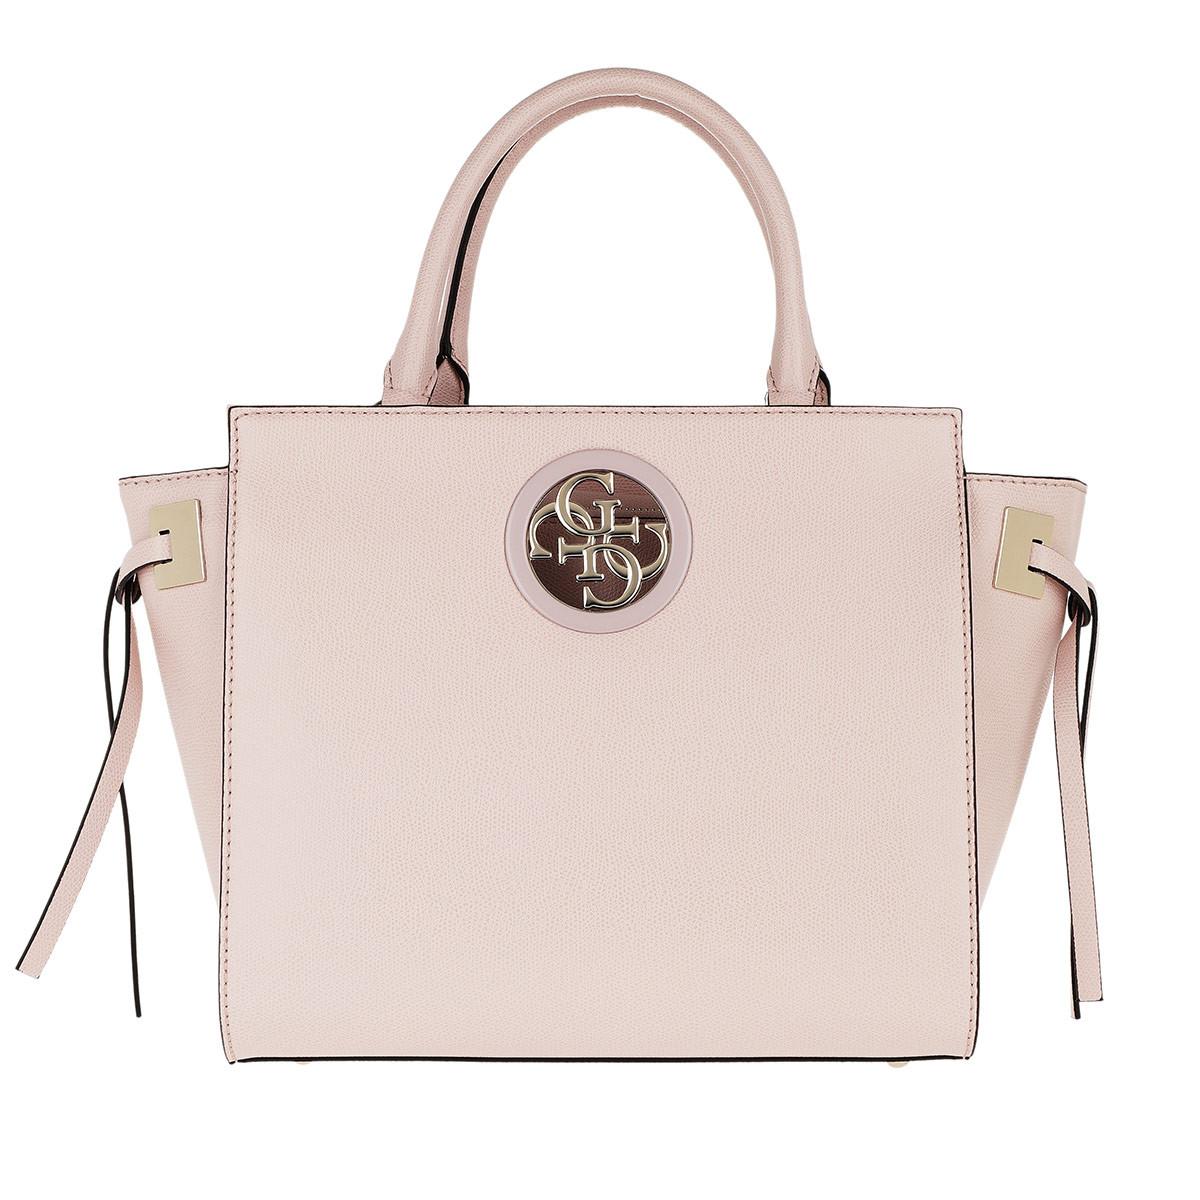 Guess Satchel Bag - Open Road Society Satchel Blush - in rosa - für Damen